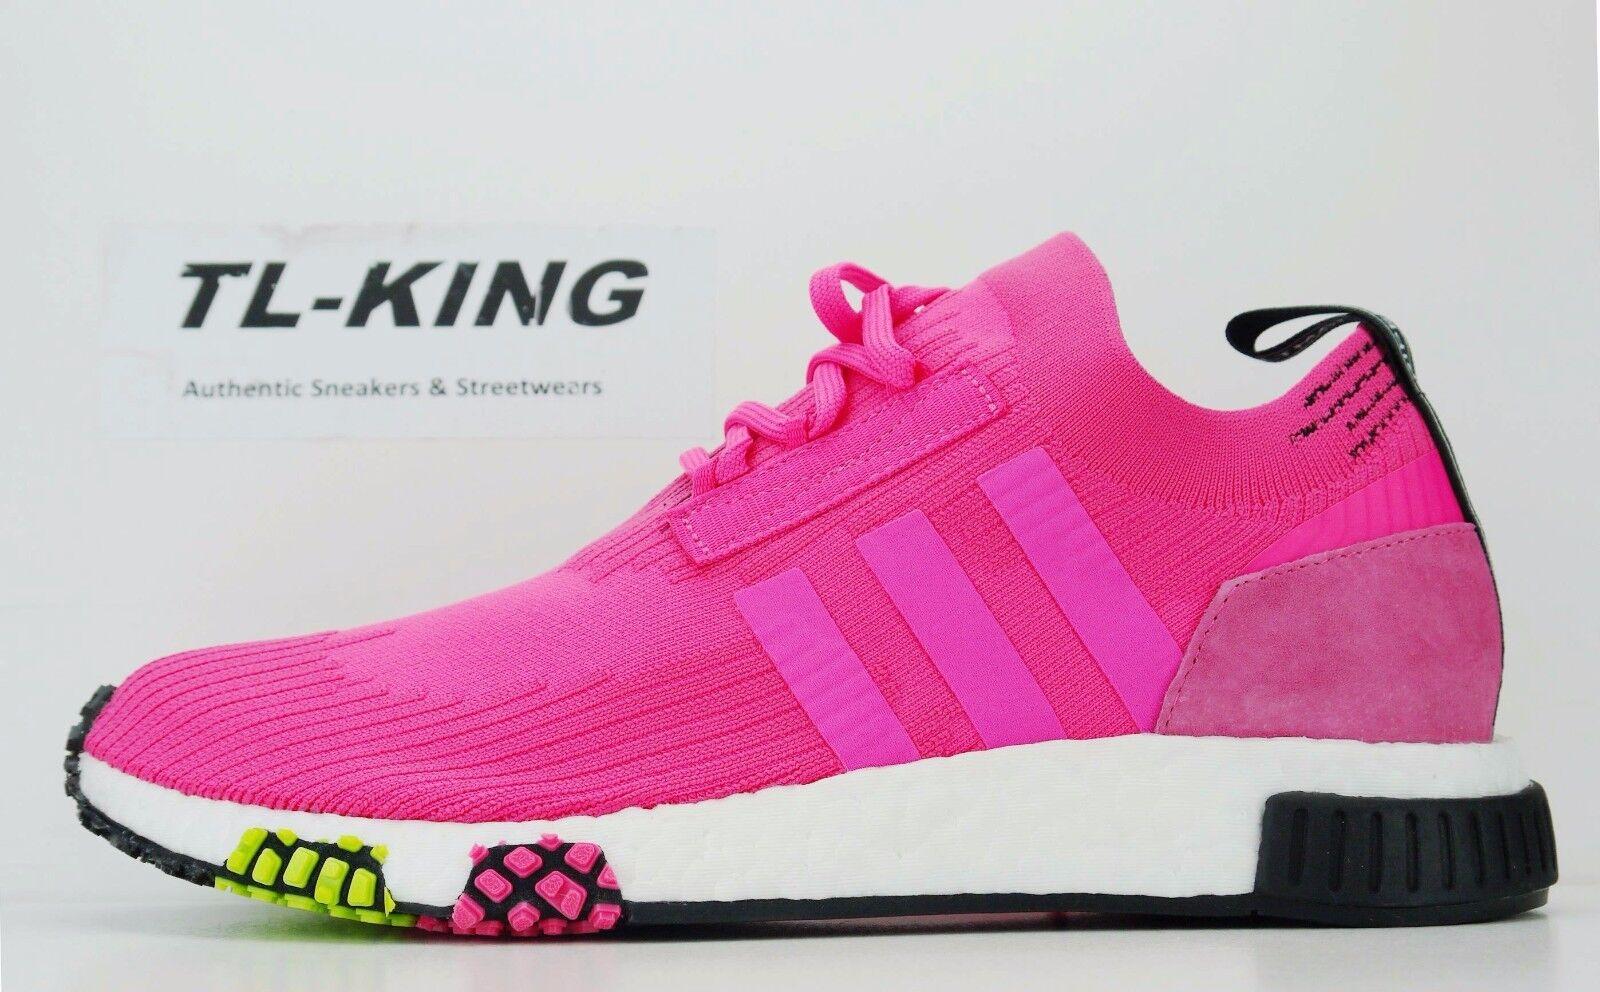 Adidas Originals NMD Racer PK Primeknit Boost Solar Pink CQ2442 Msrp  180 DM